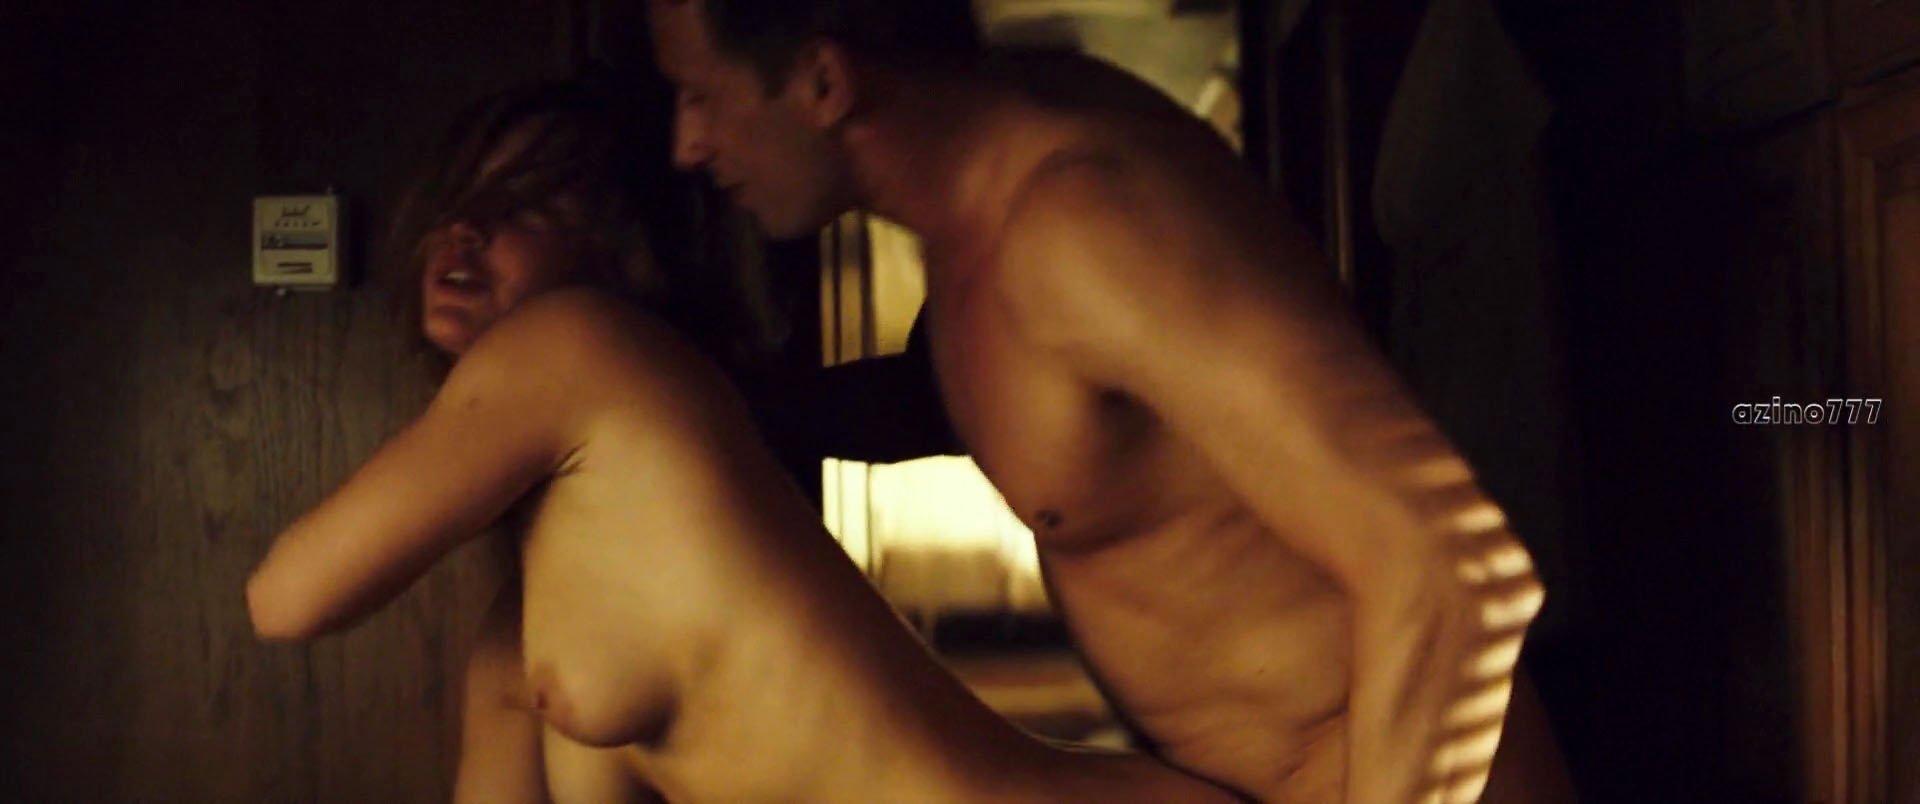 Adele exarchopoulos nude sex scene in le fidele 7